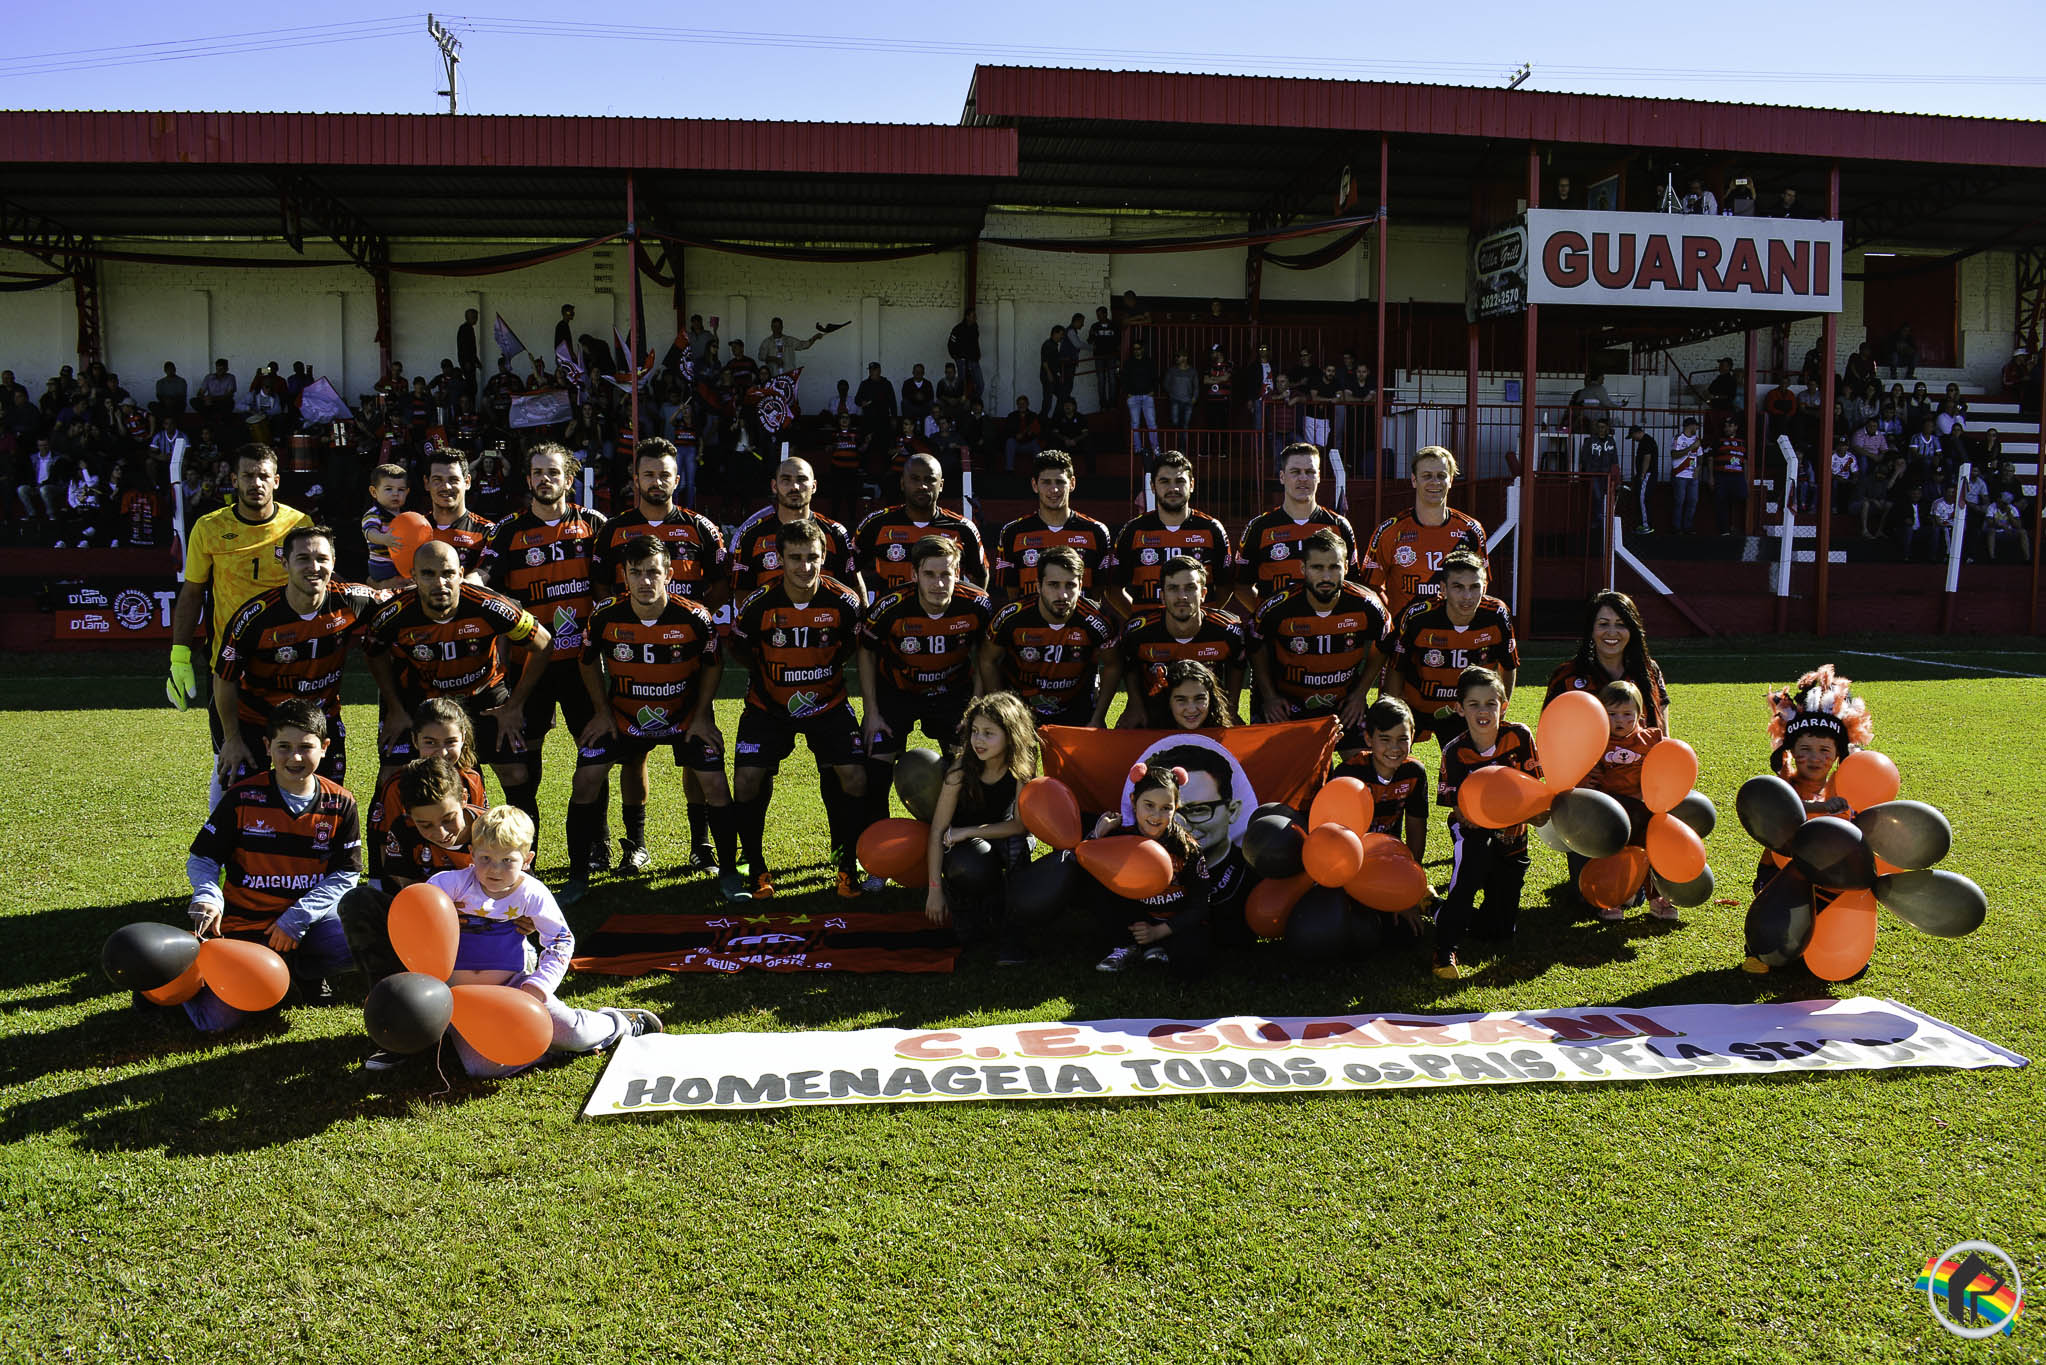 Peperi transmite Guarani direto de Tigrinhos neste domingo